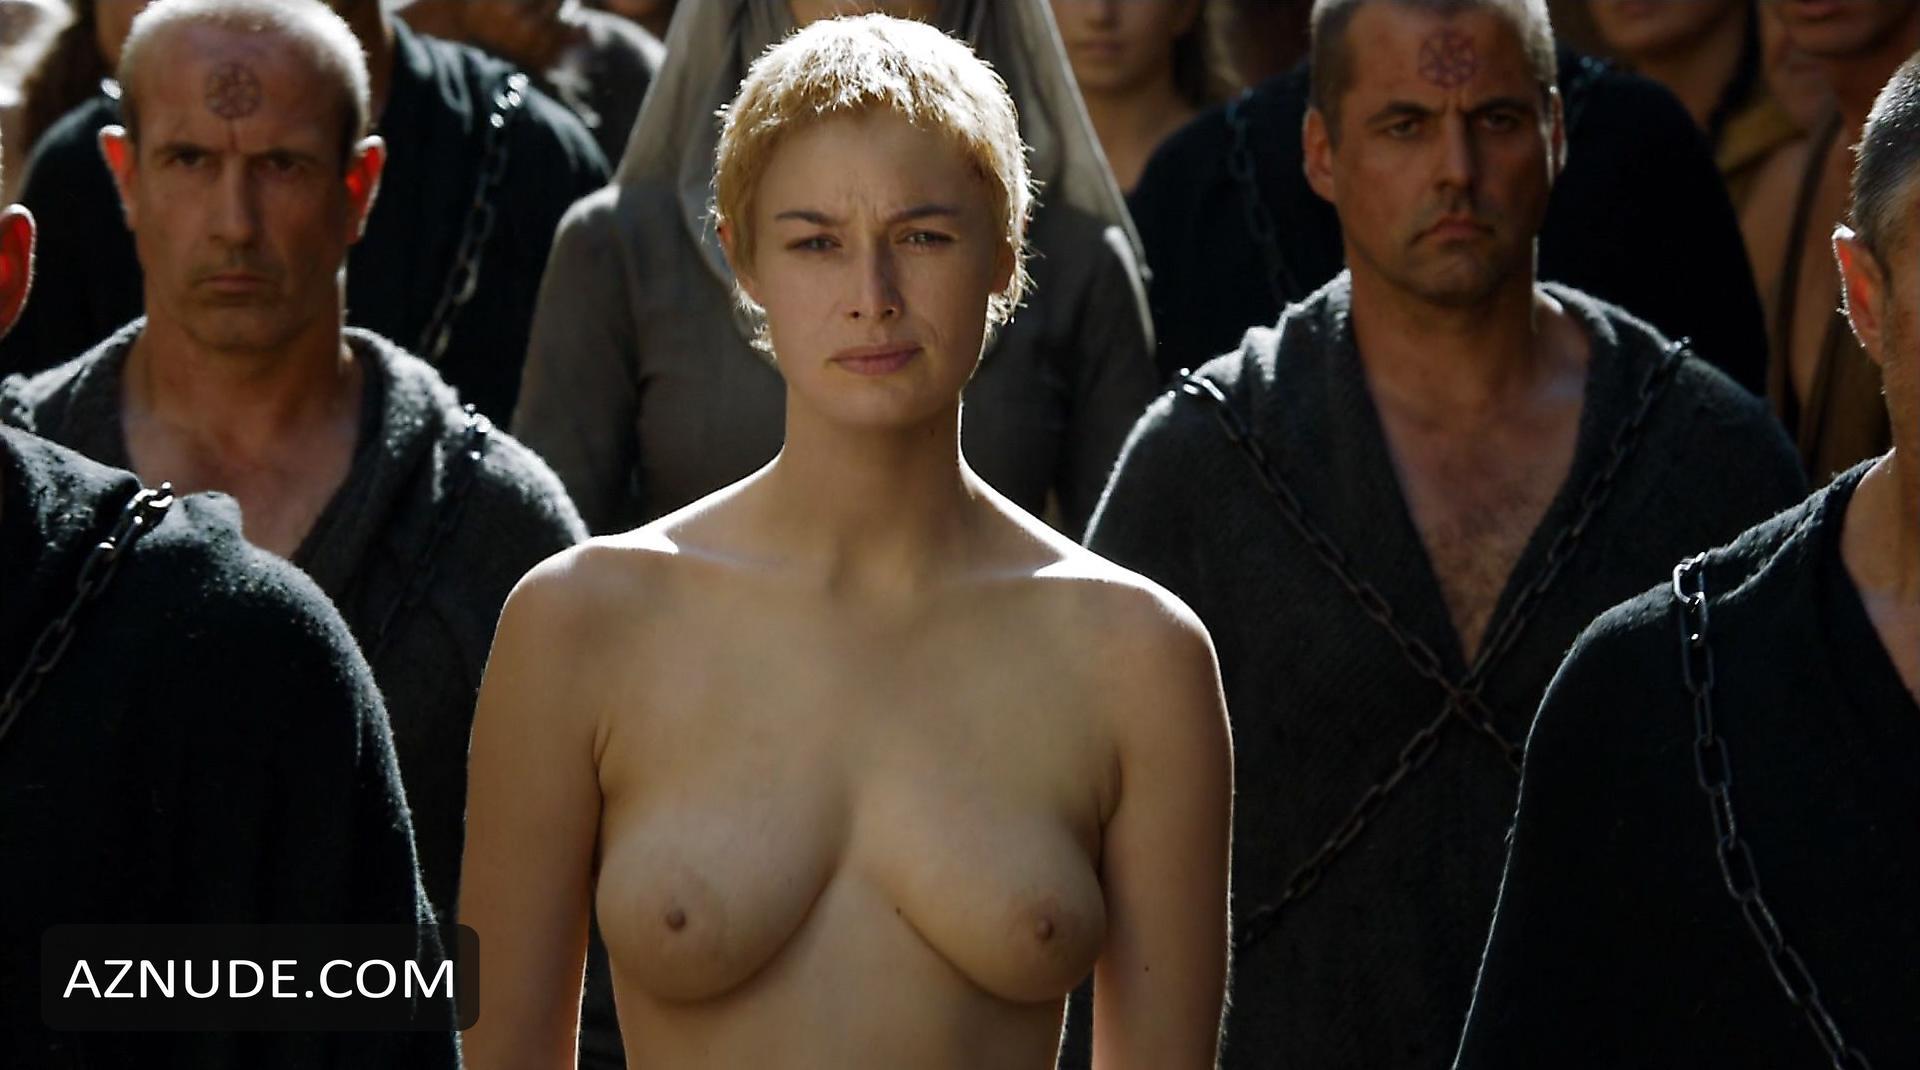 Lena headey nude private pics and sex scenes